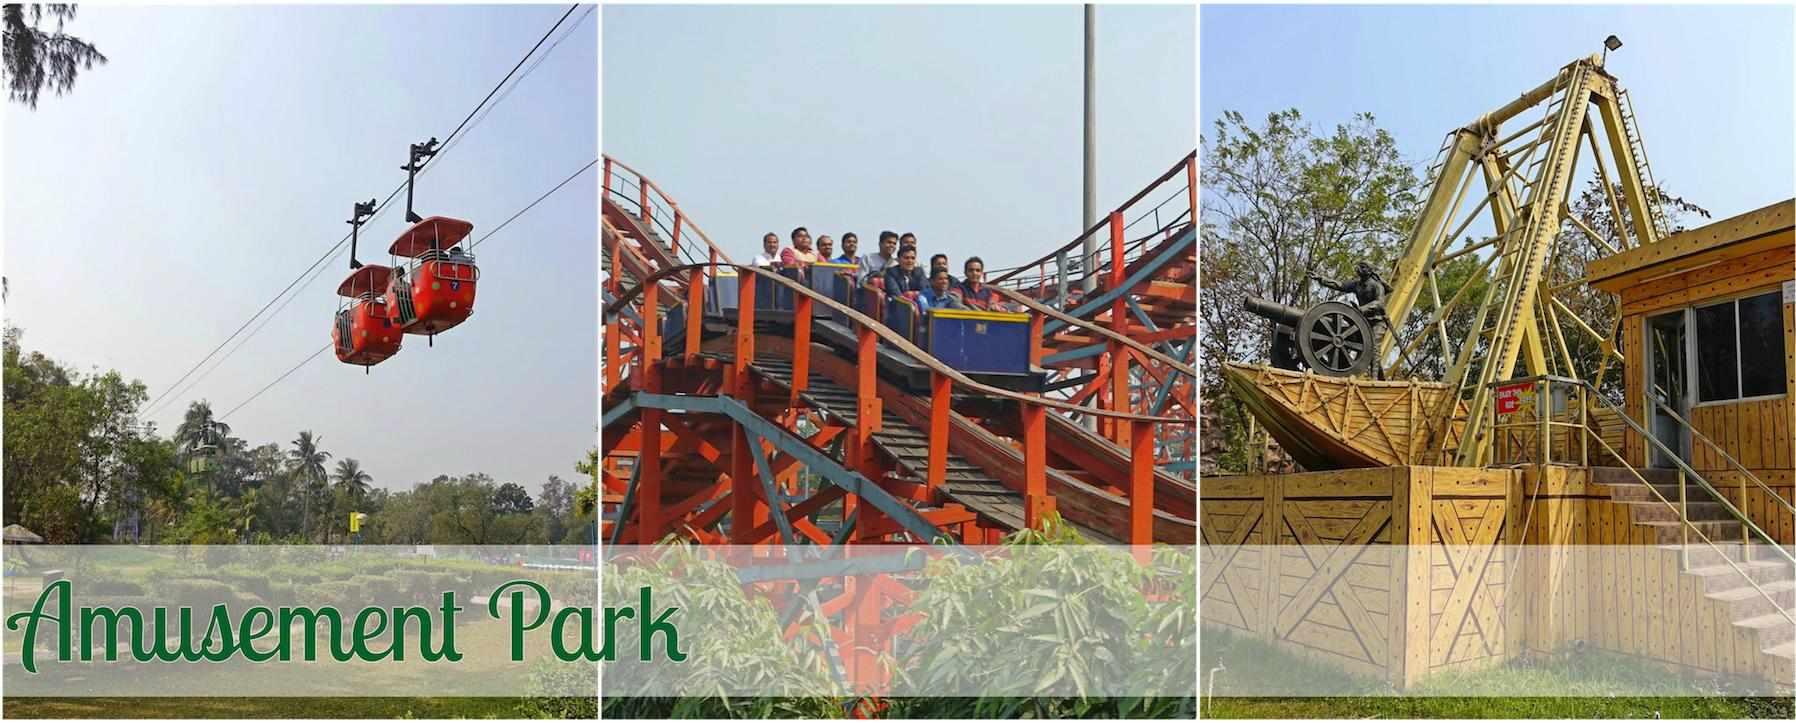 Nicco-amusement-park.